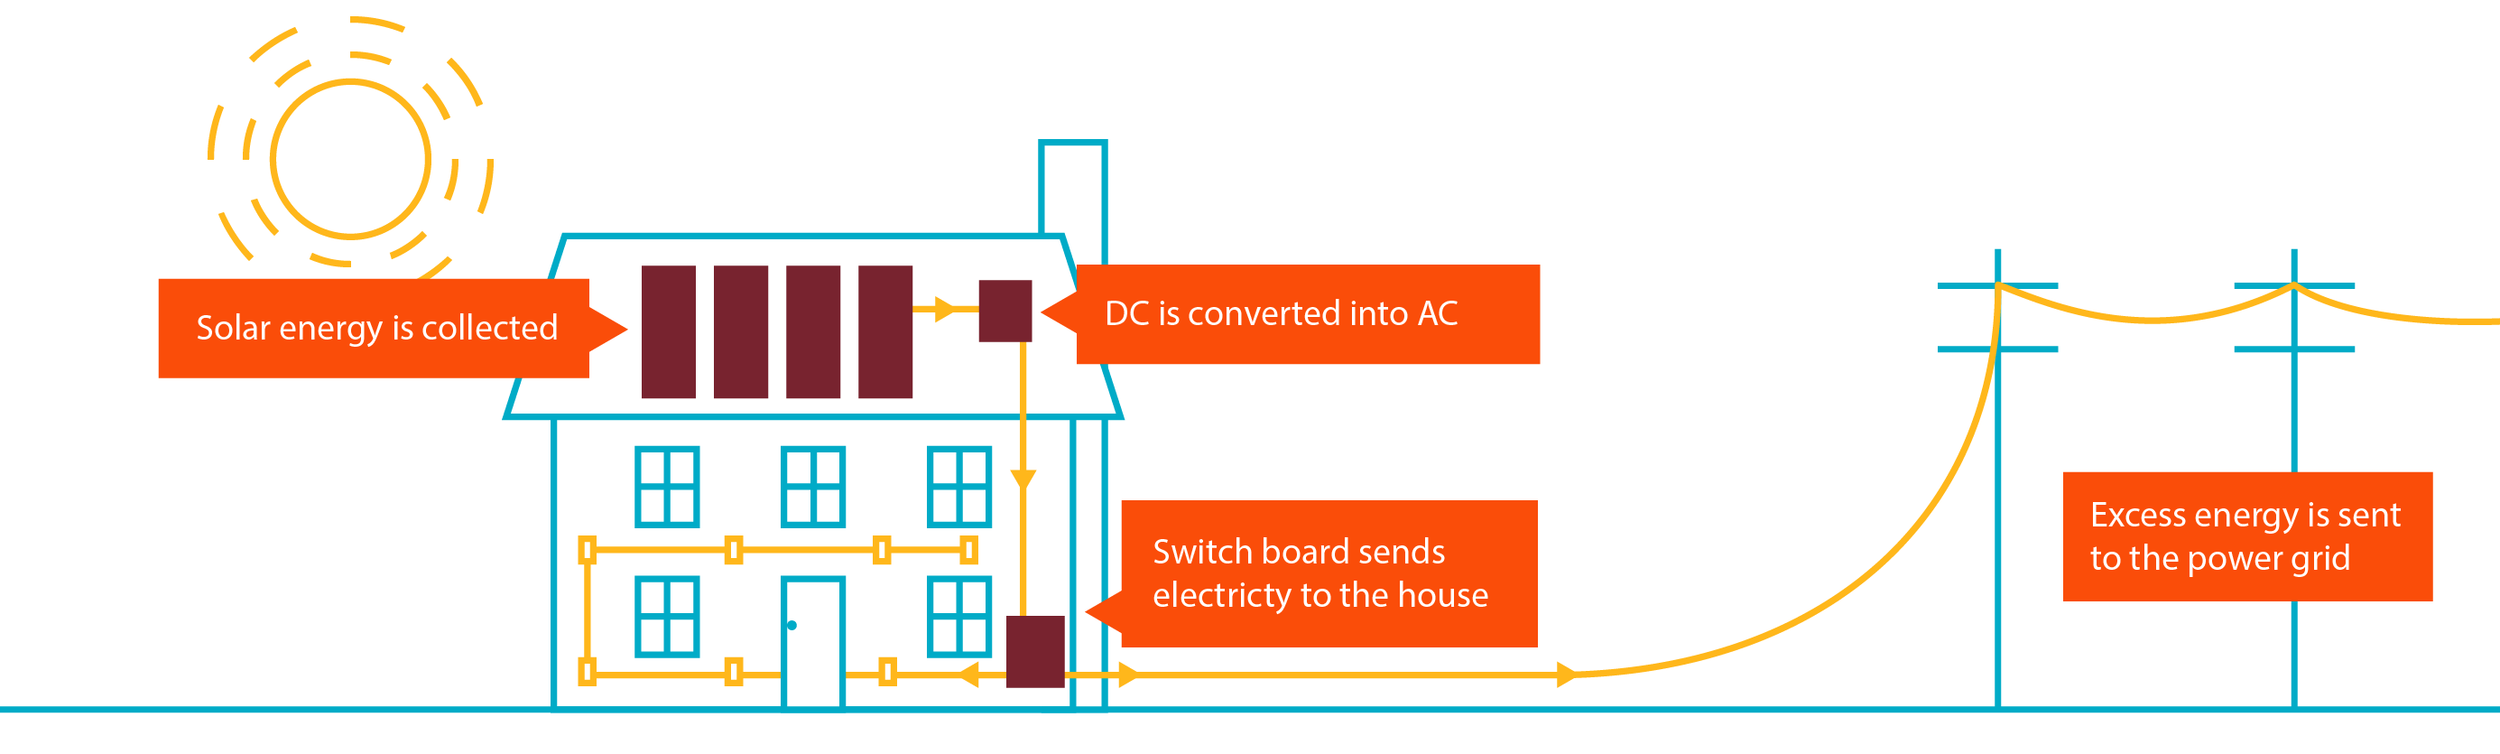 How ToGetElectricityFromSolar.png